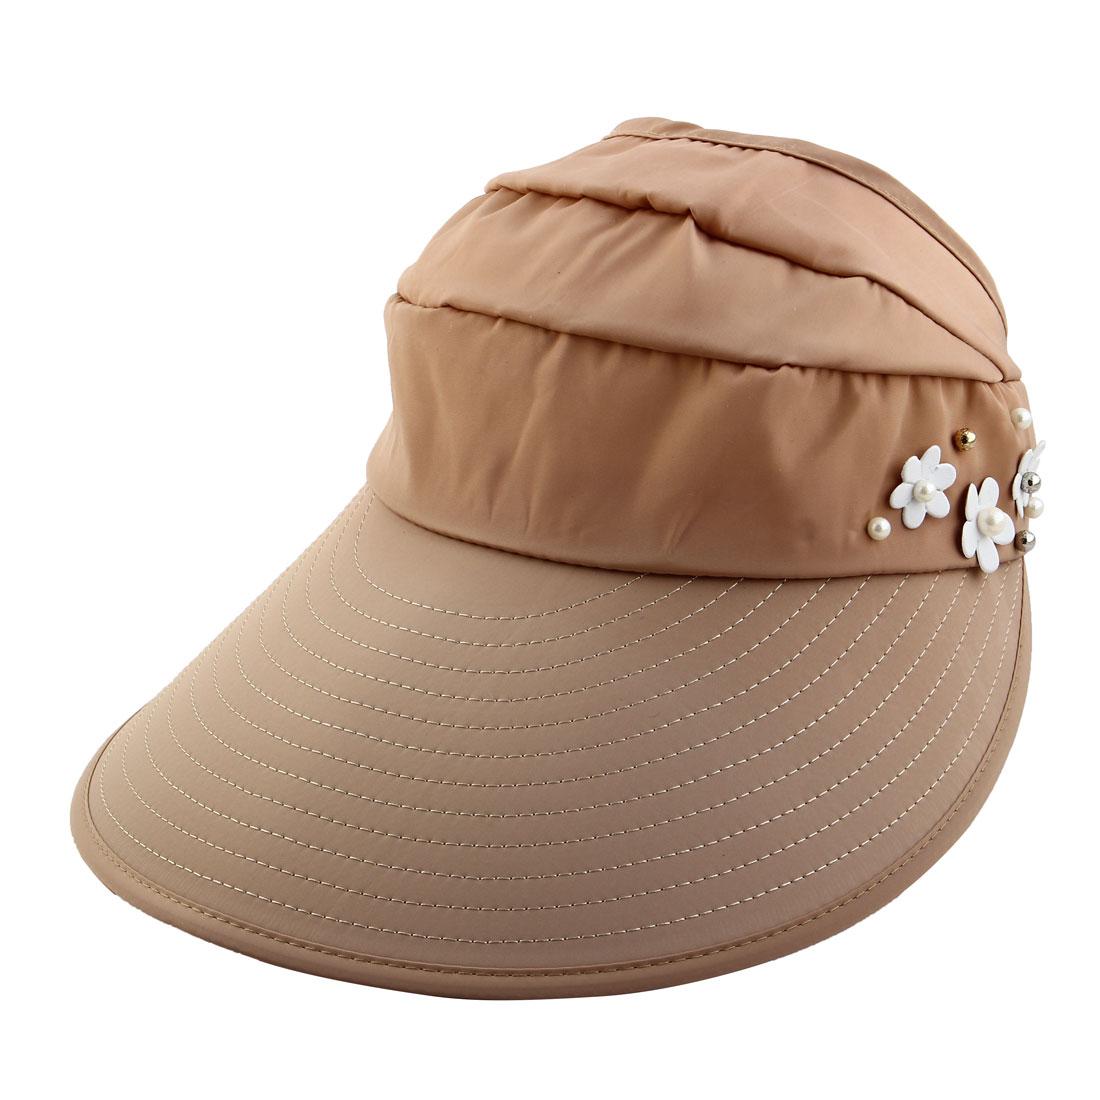 Woman Flower Decor Adjustable Travel Sports Summer Beach Floppy Cap Sun Visor Hat Khaki